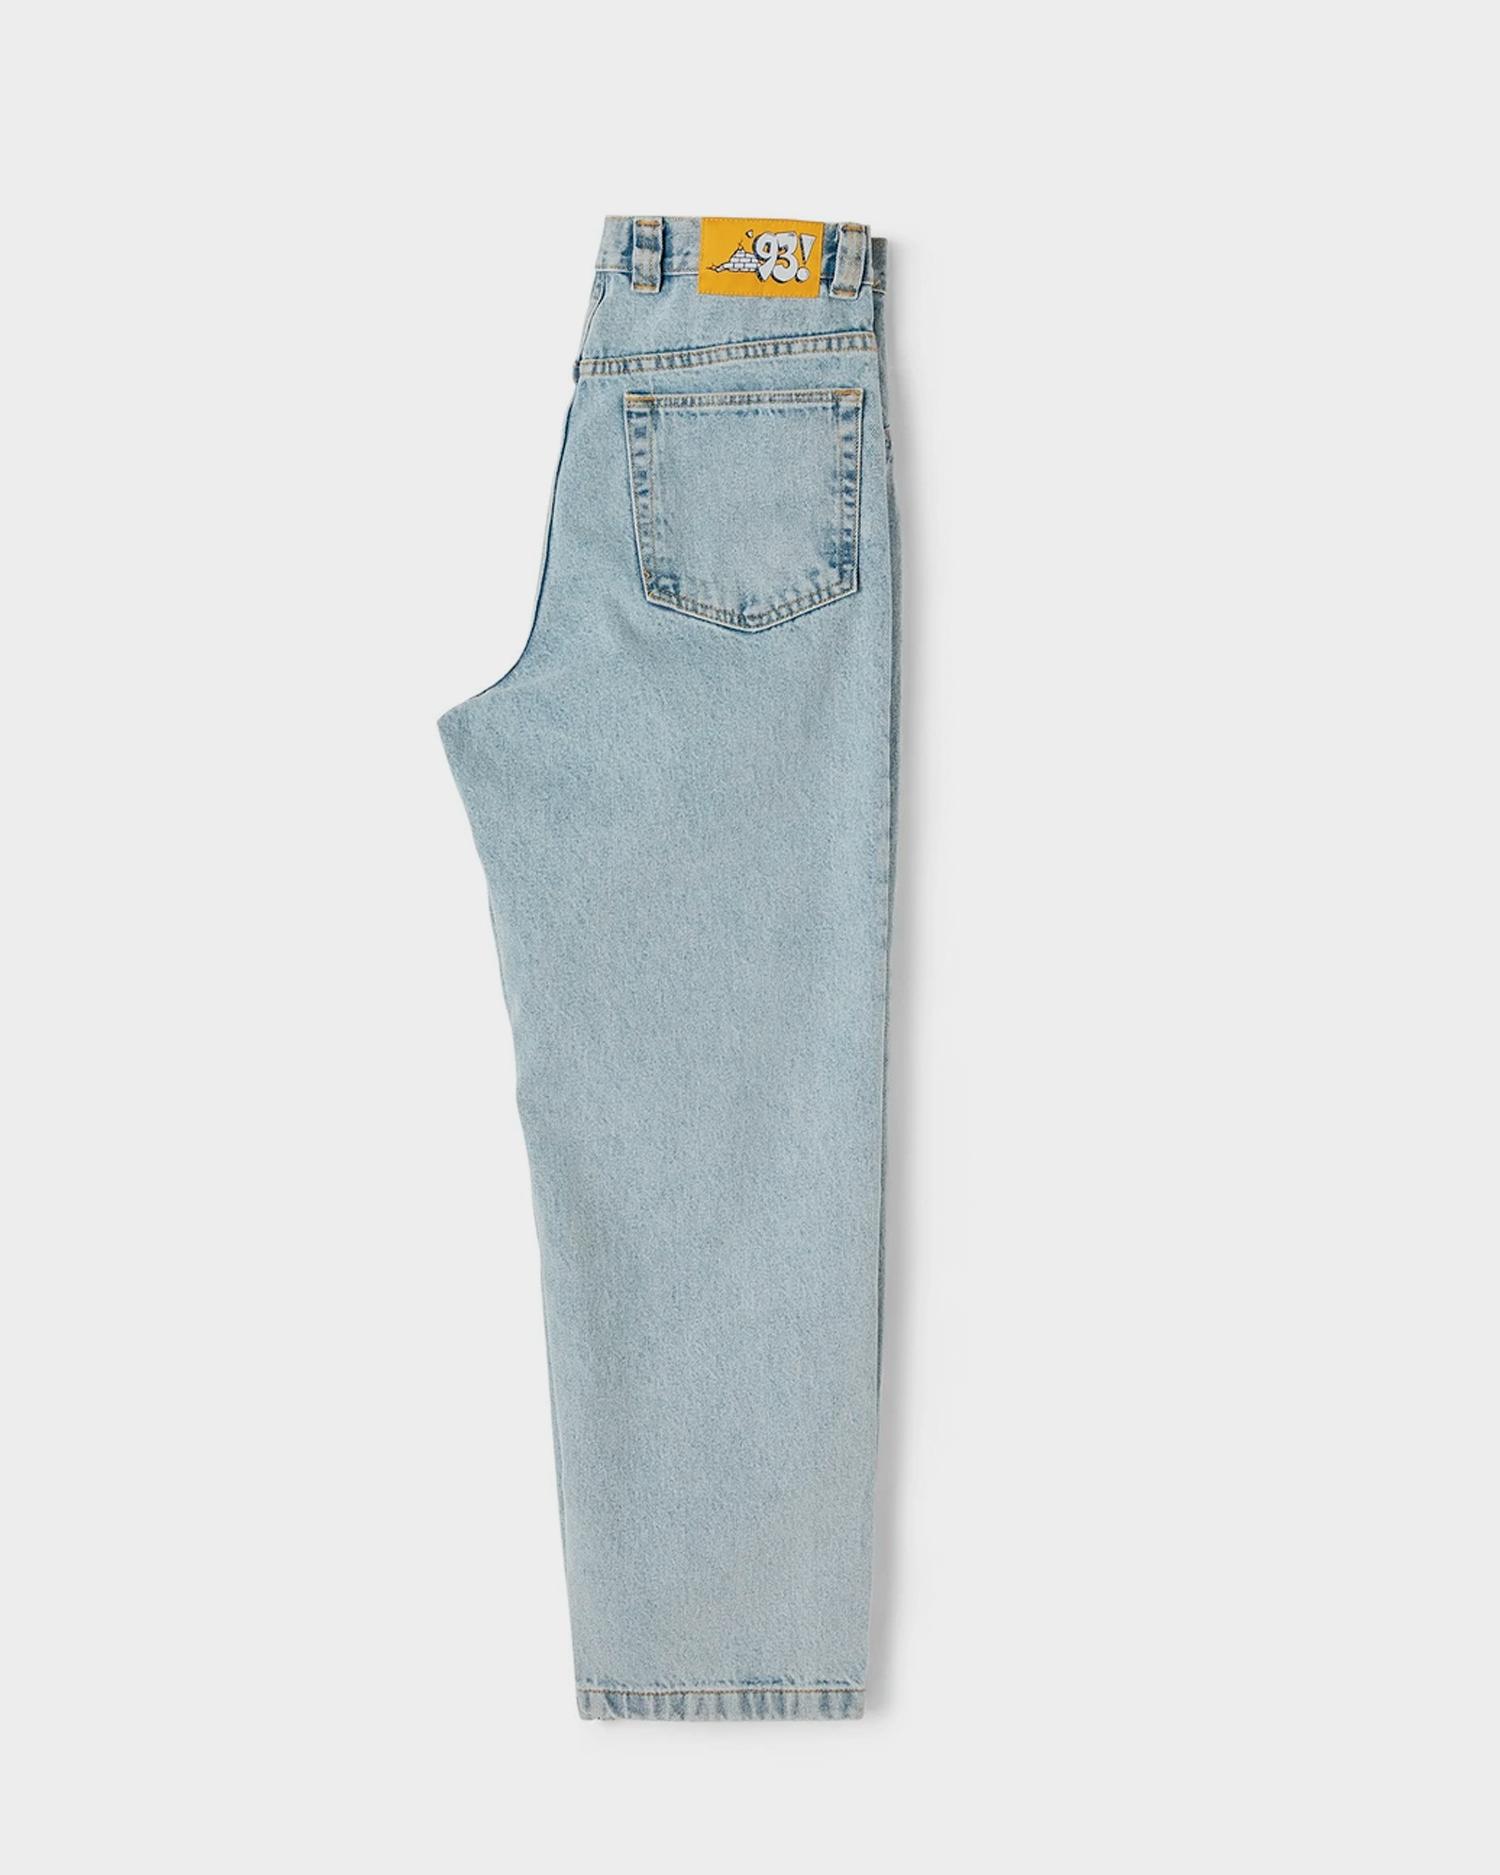 Polar 93 Denim Jeans Light Blue